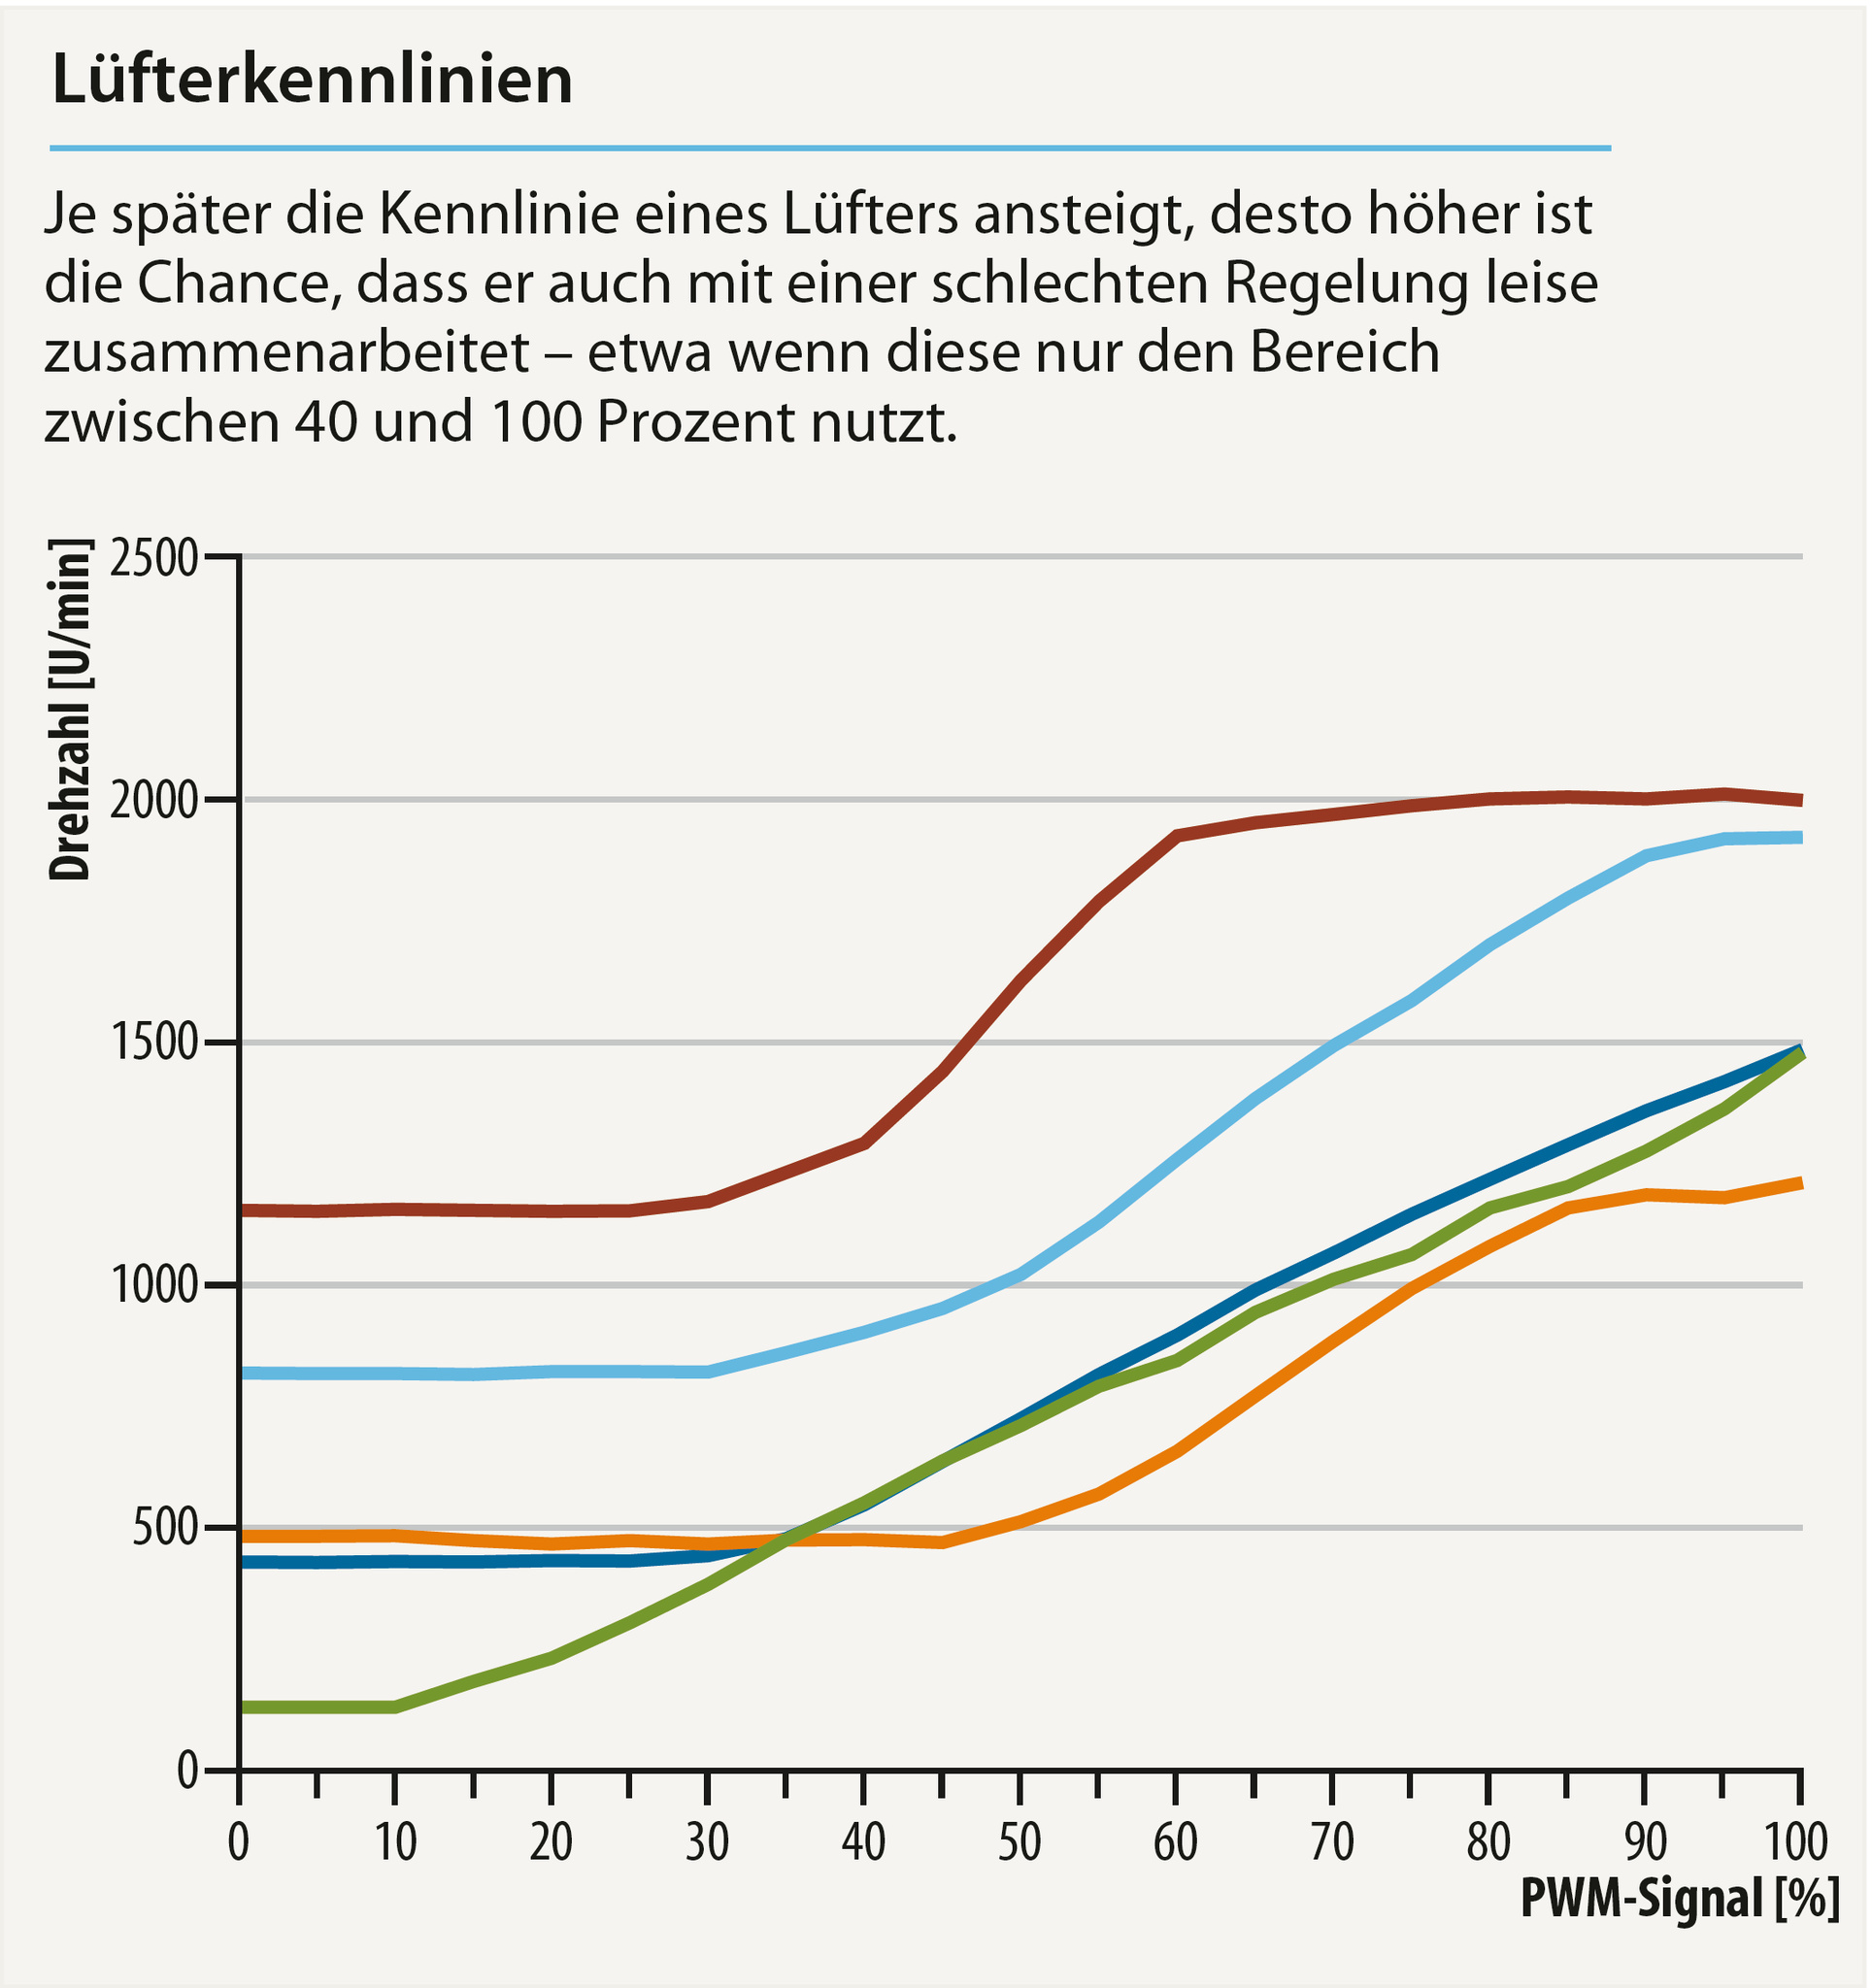 Großartig 4 Draht Trockner Stecker Diagramm Bilder - Der ...